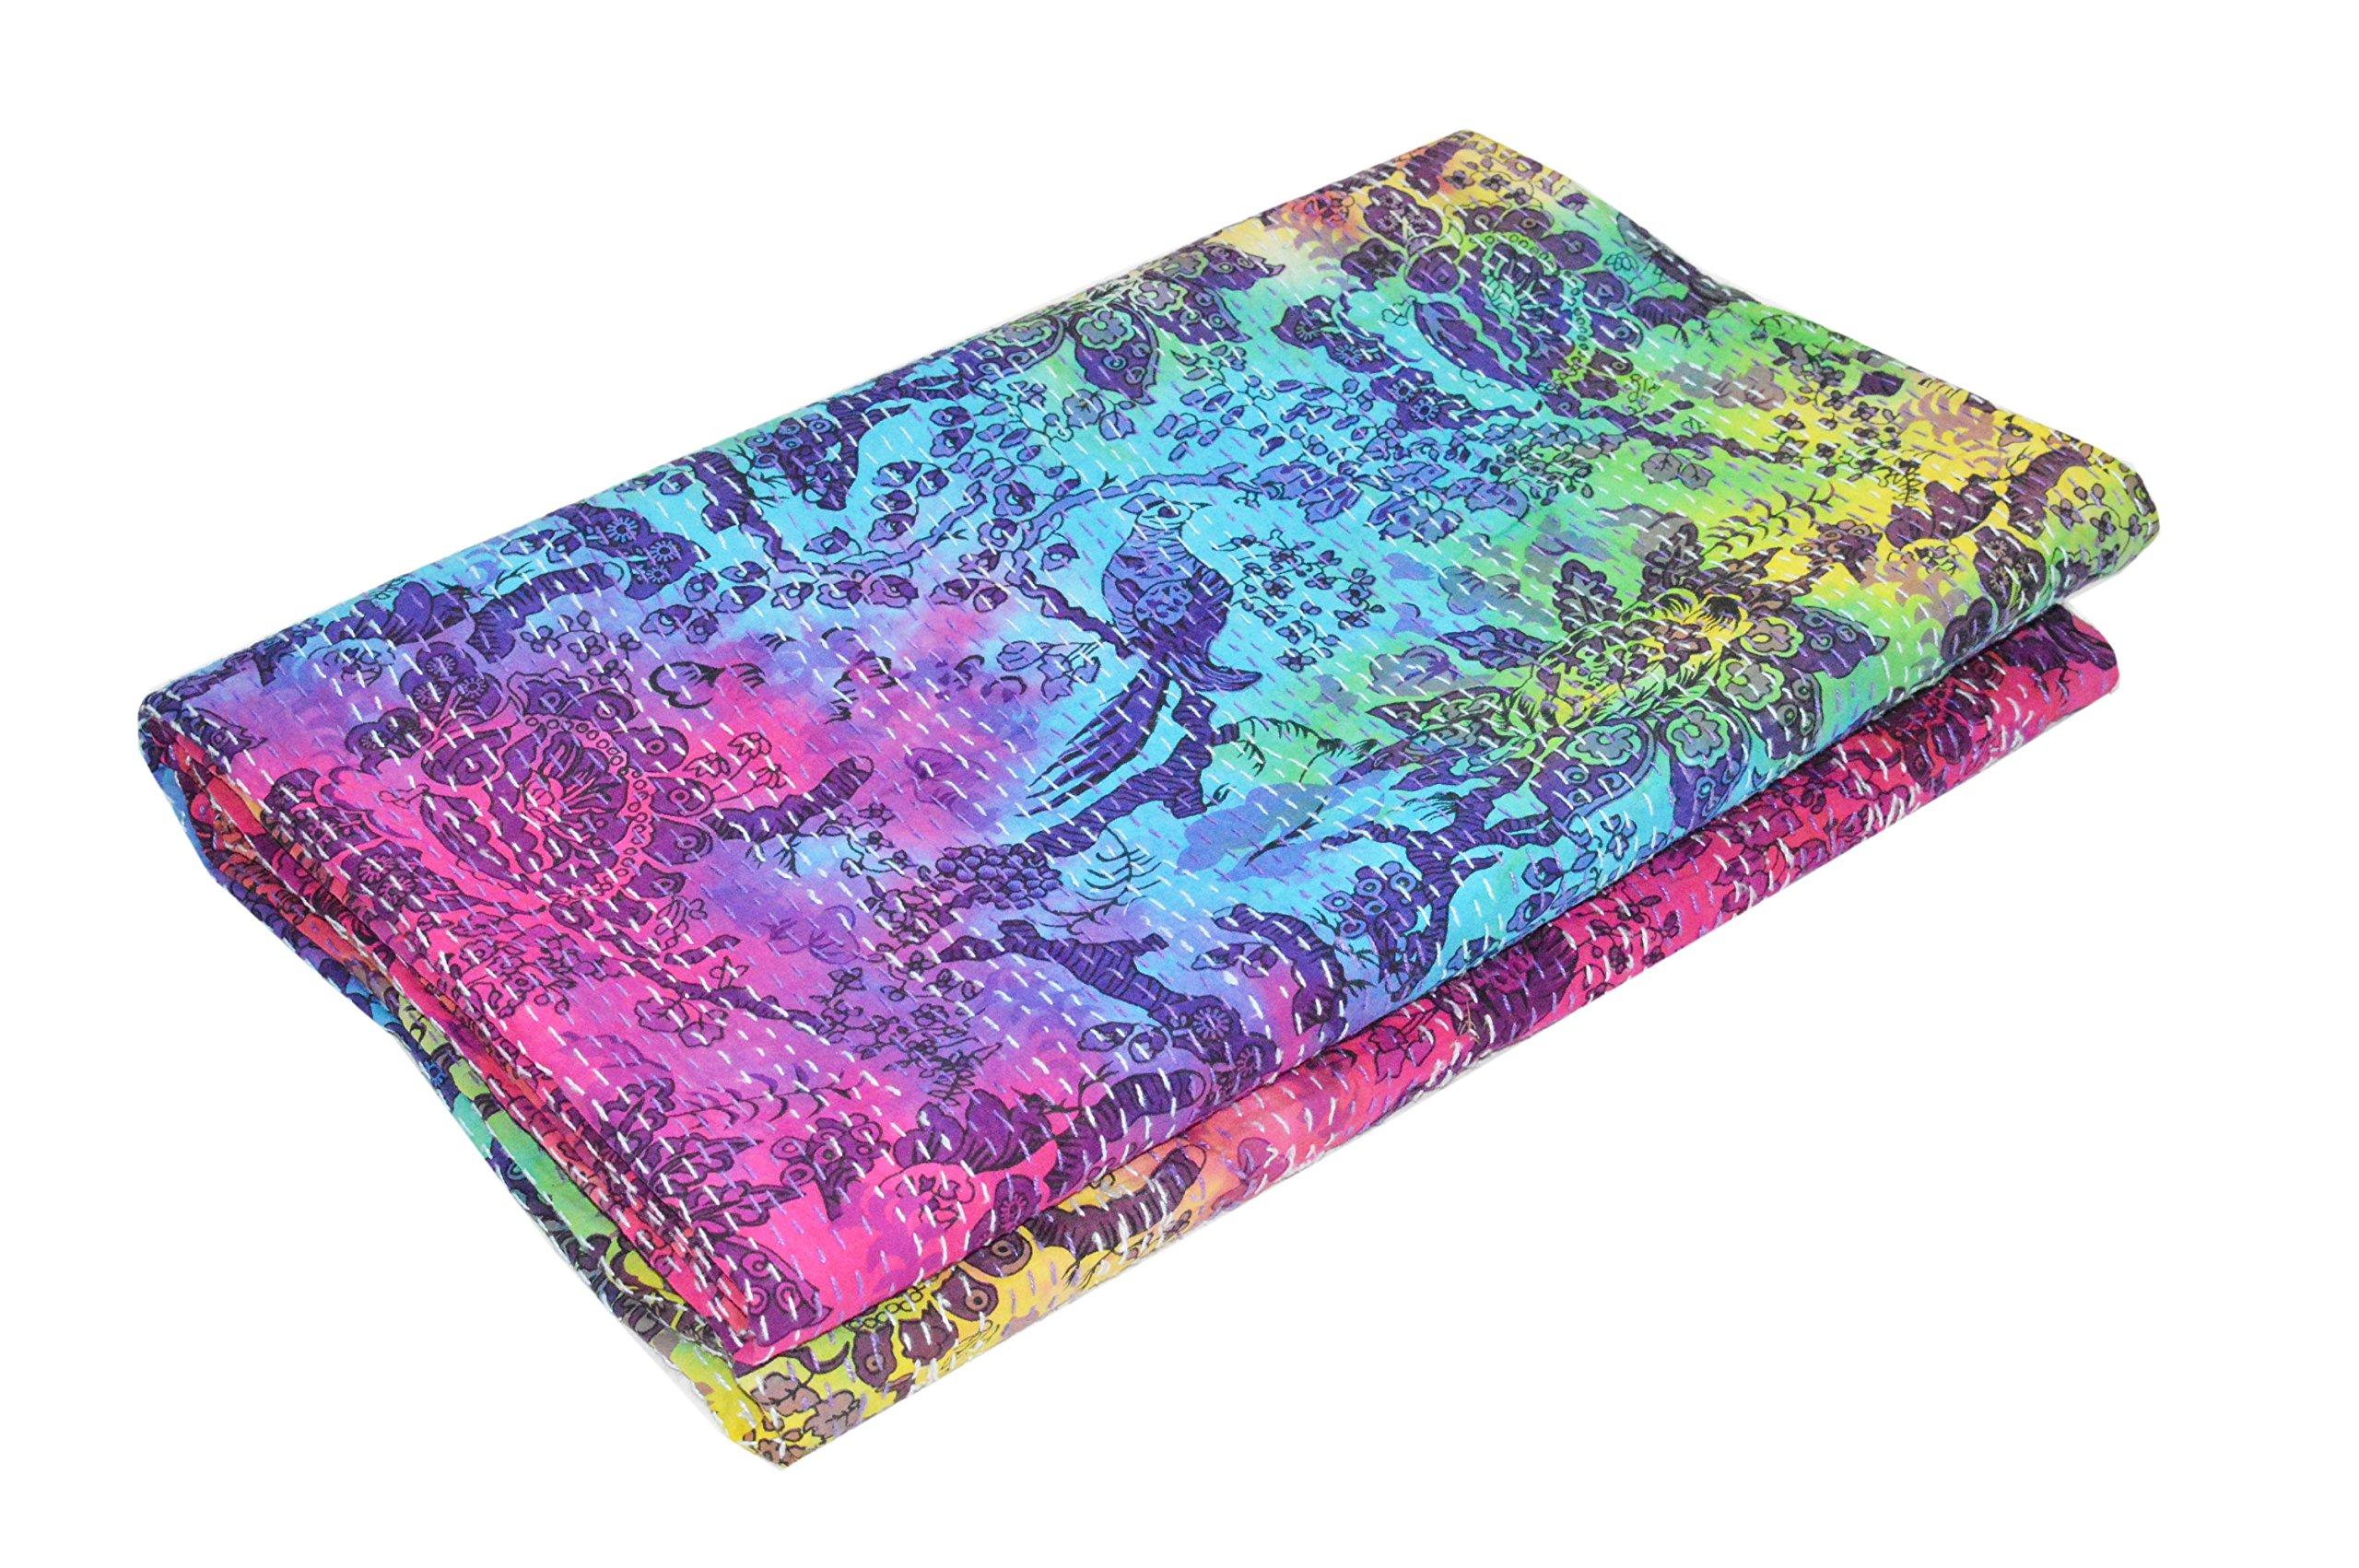 Vedant Designs Indian Bird Pirnt Kantha Quilt Queen Size Tie Dye Reversible Bedspread Handmade Cotton Floral Bedsheet Home Décor 106'' X 88'' Inches